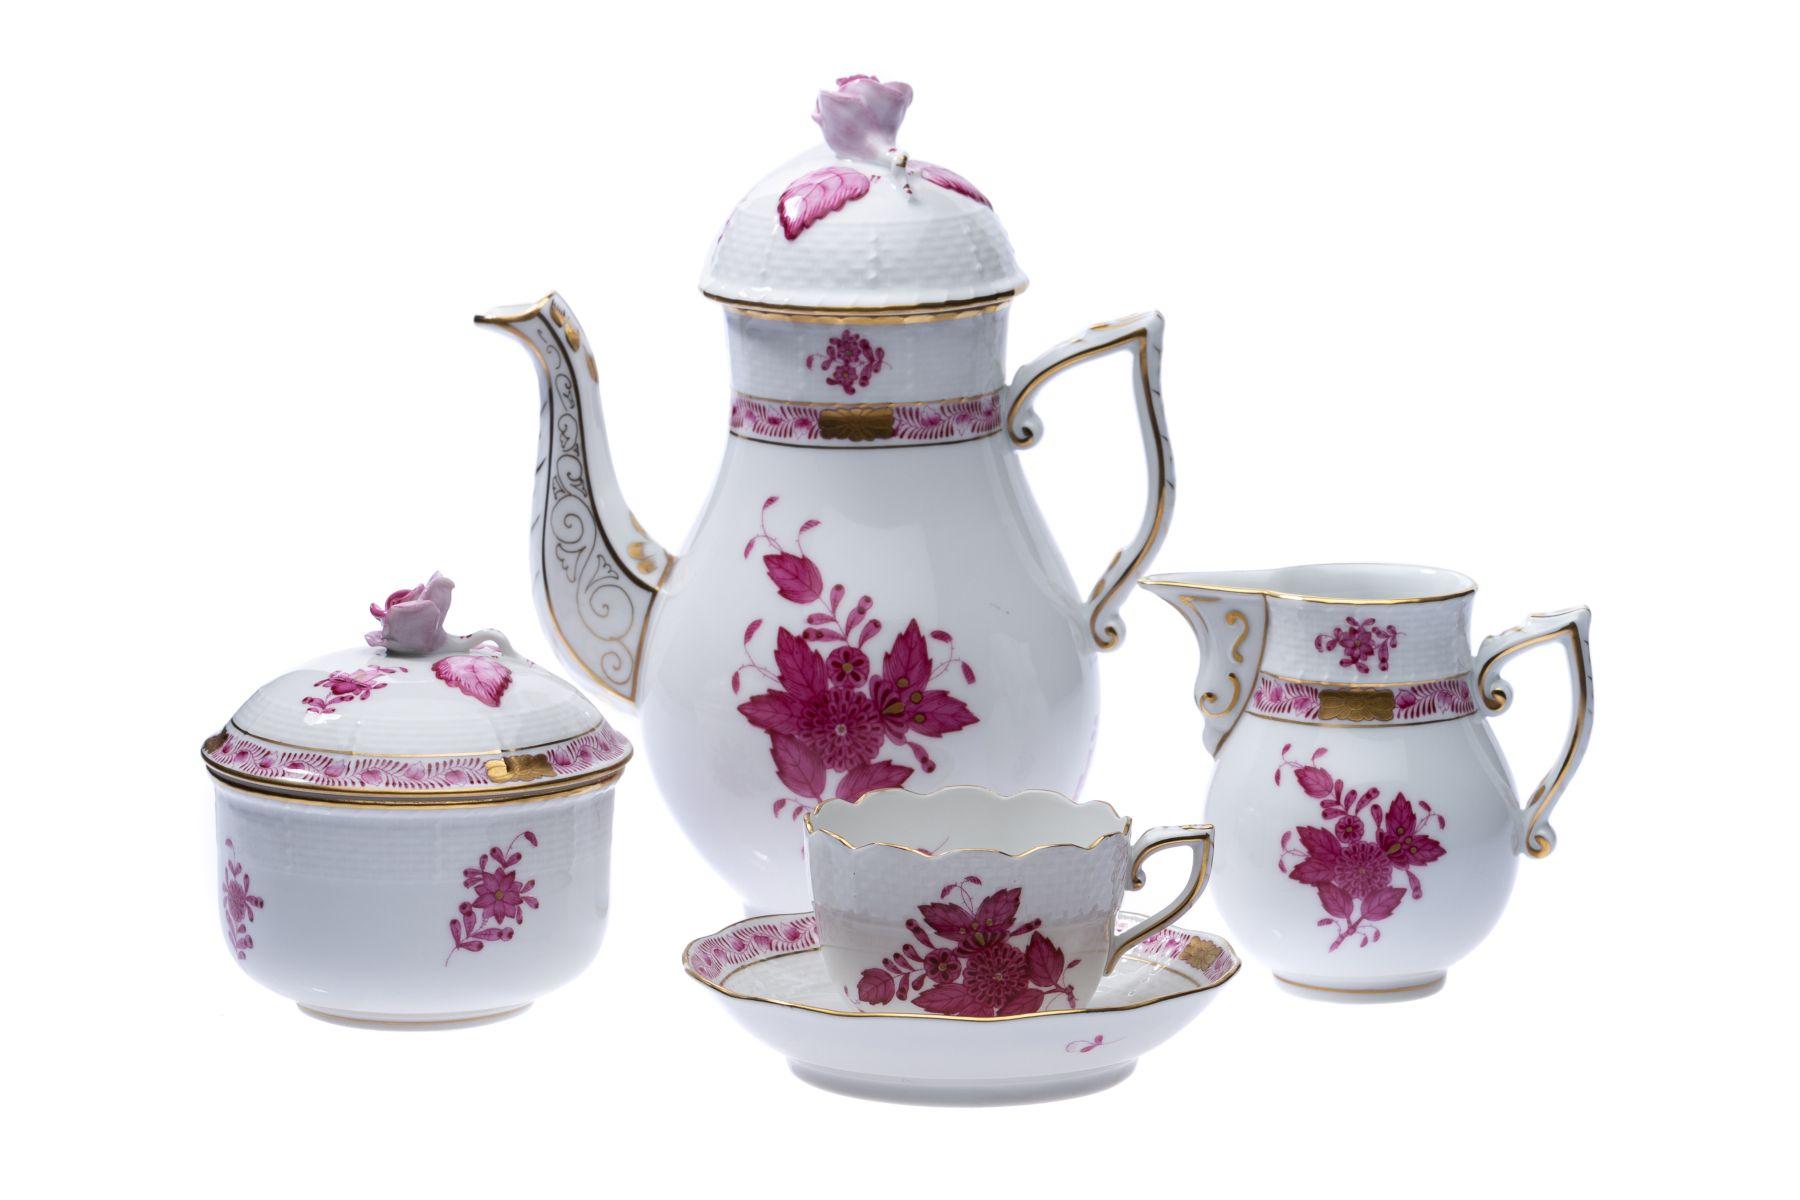 "#154 Herend Moccaservice 15 pieces form Osier decor ""Apponyi purpur"" | Herend Moccaservice 15 teilig  Form Osier Dekor ""Apponyi purpur"" Image"